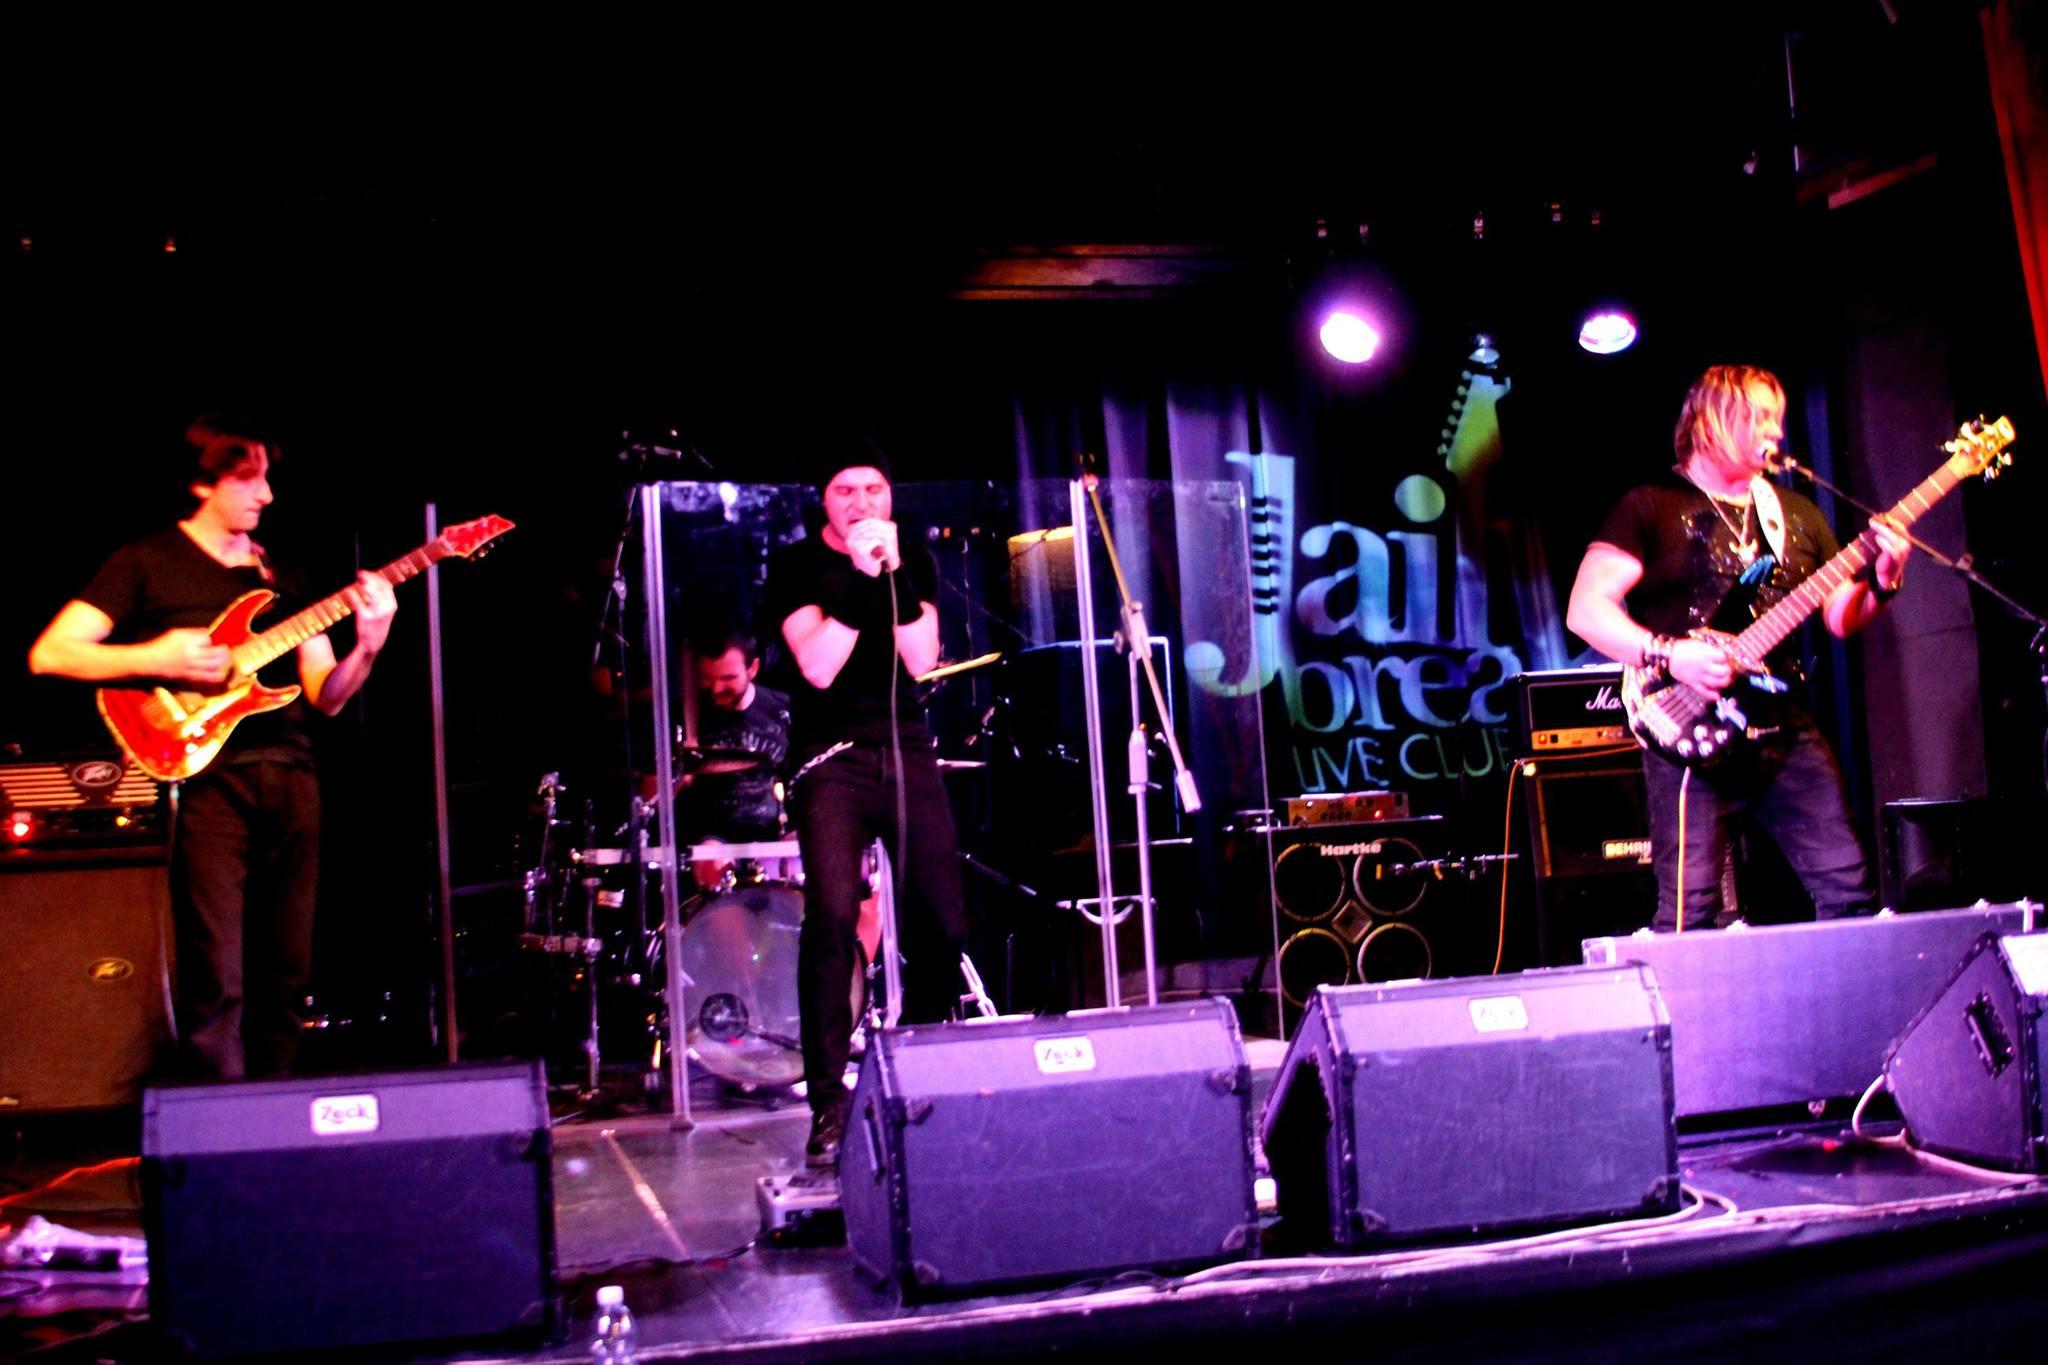 Live@ADC Festival, Jailbreak Live Club, Rome, Italy - 17.4.2016